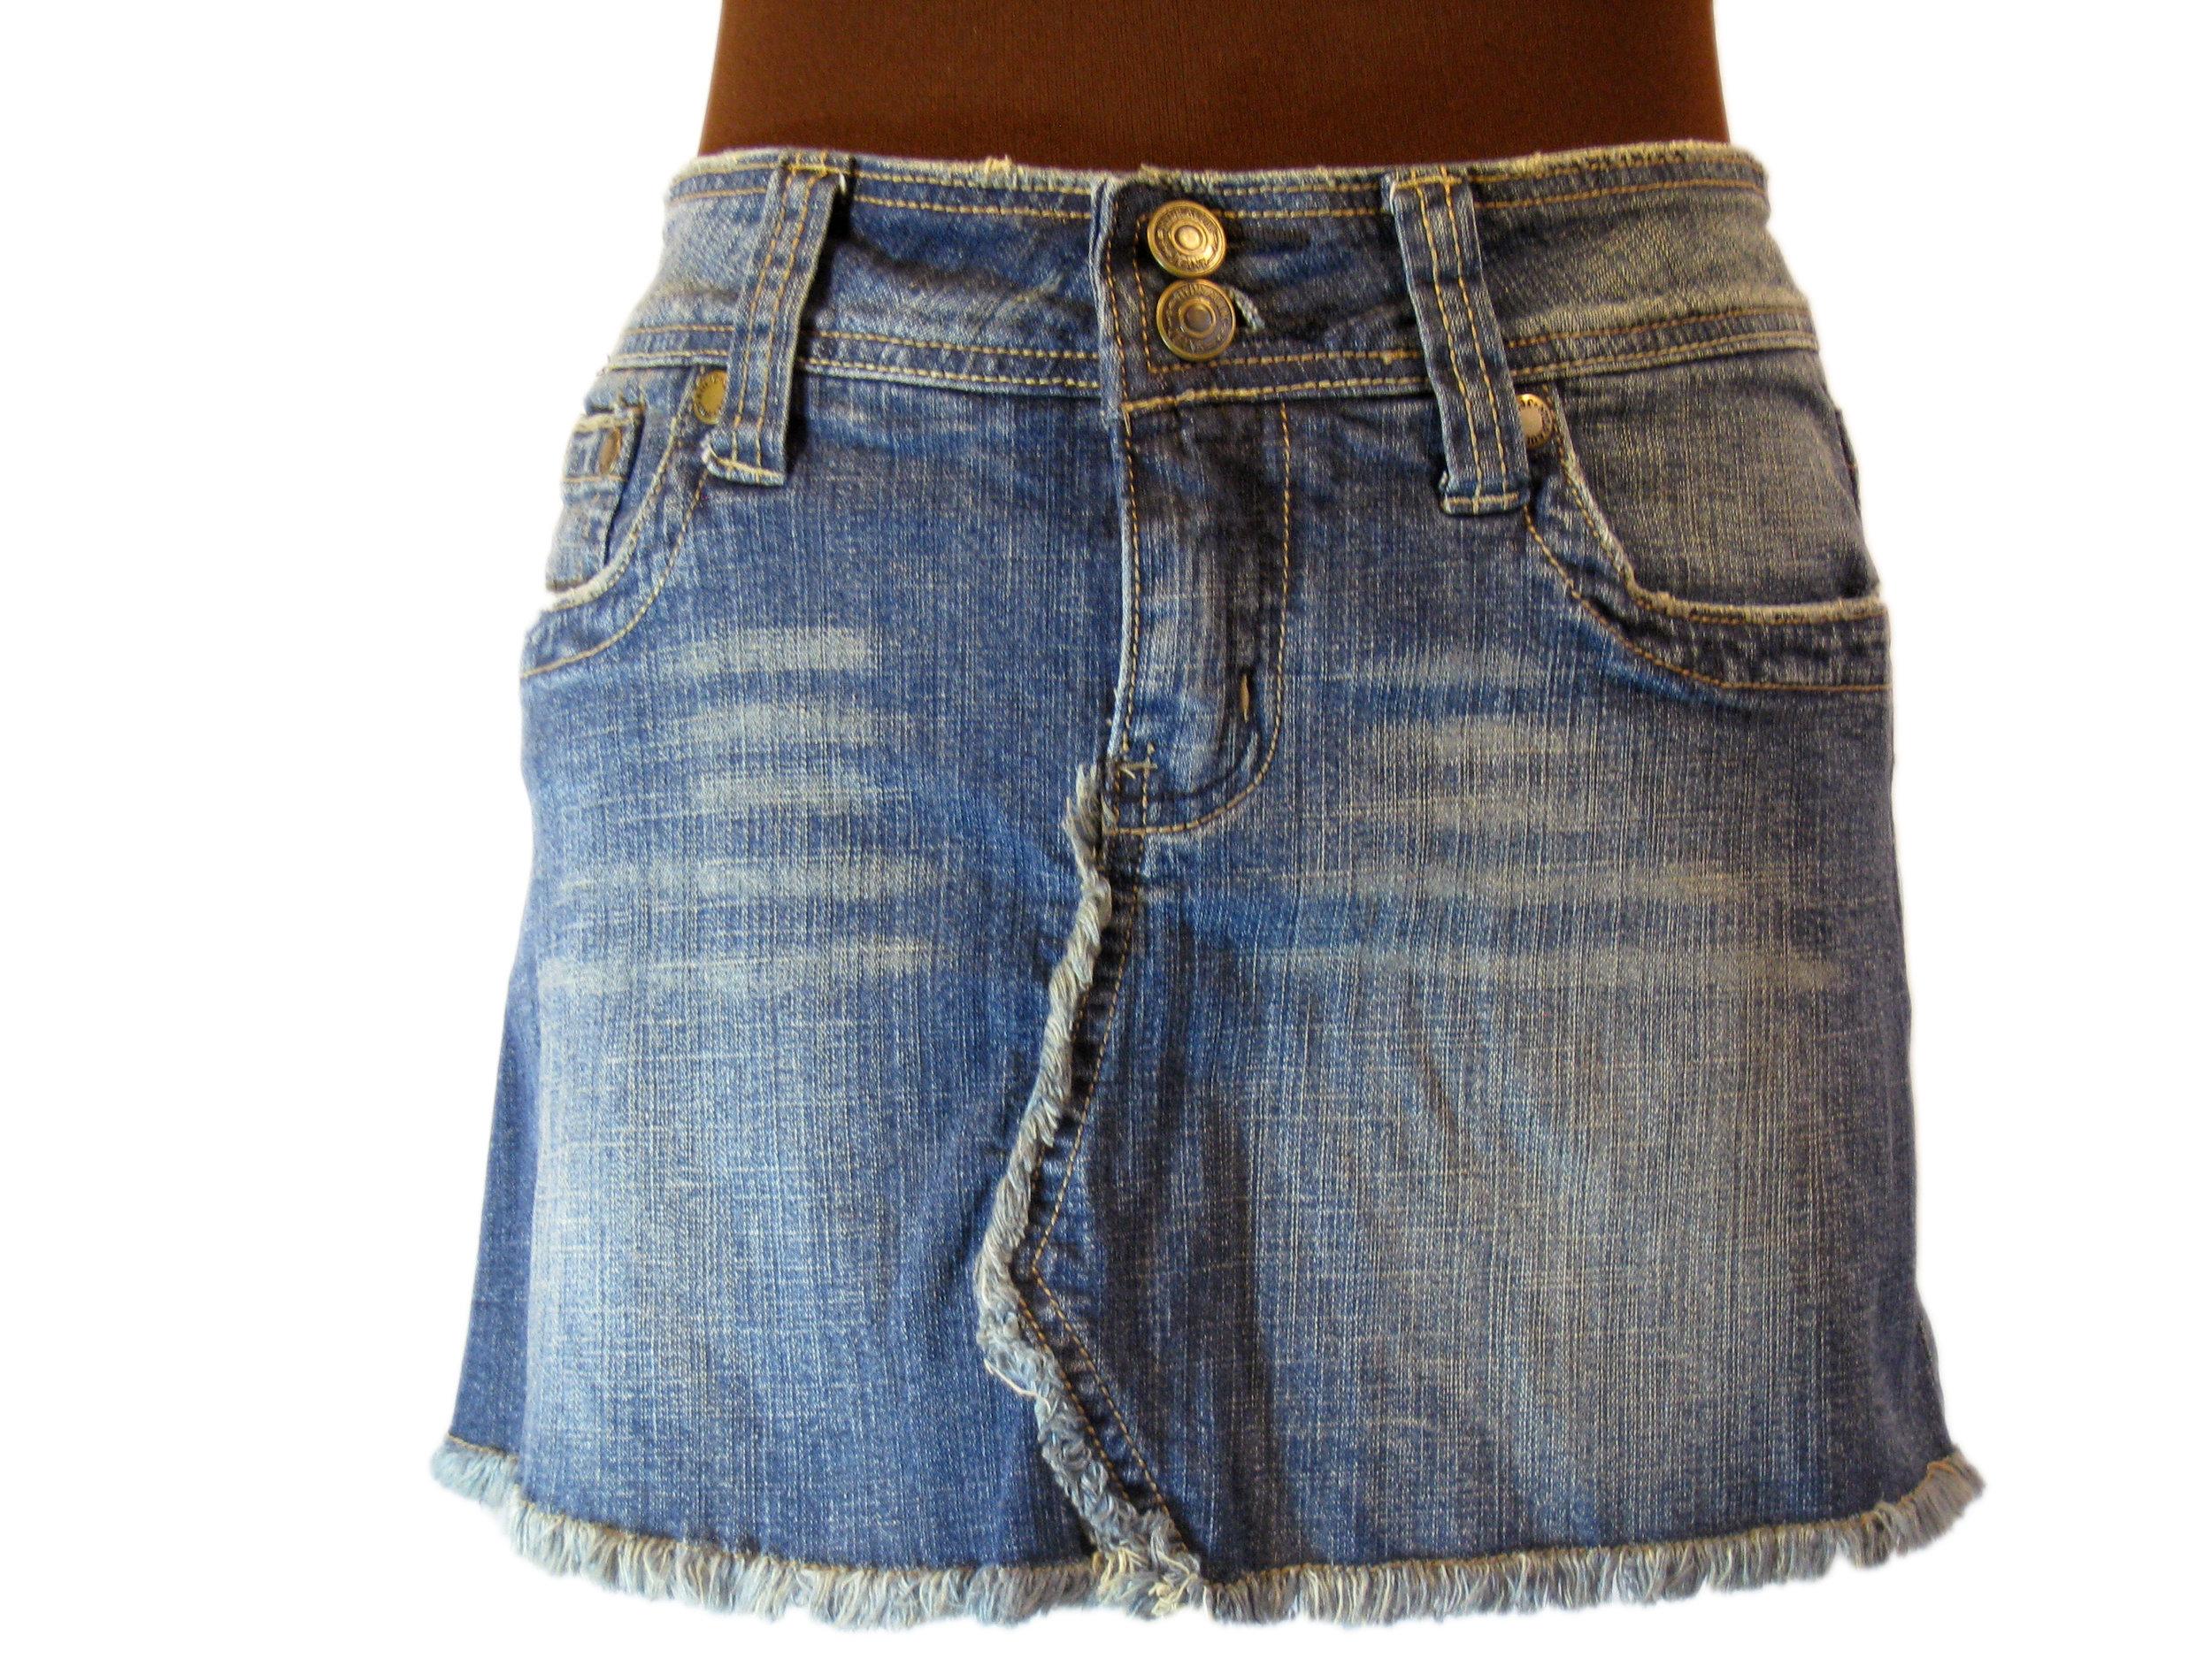 d3fa7c15a Hydraulic Denim Skirt l Size 7/8 — Second Hand Swank